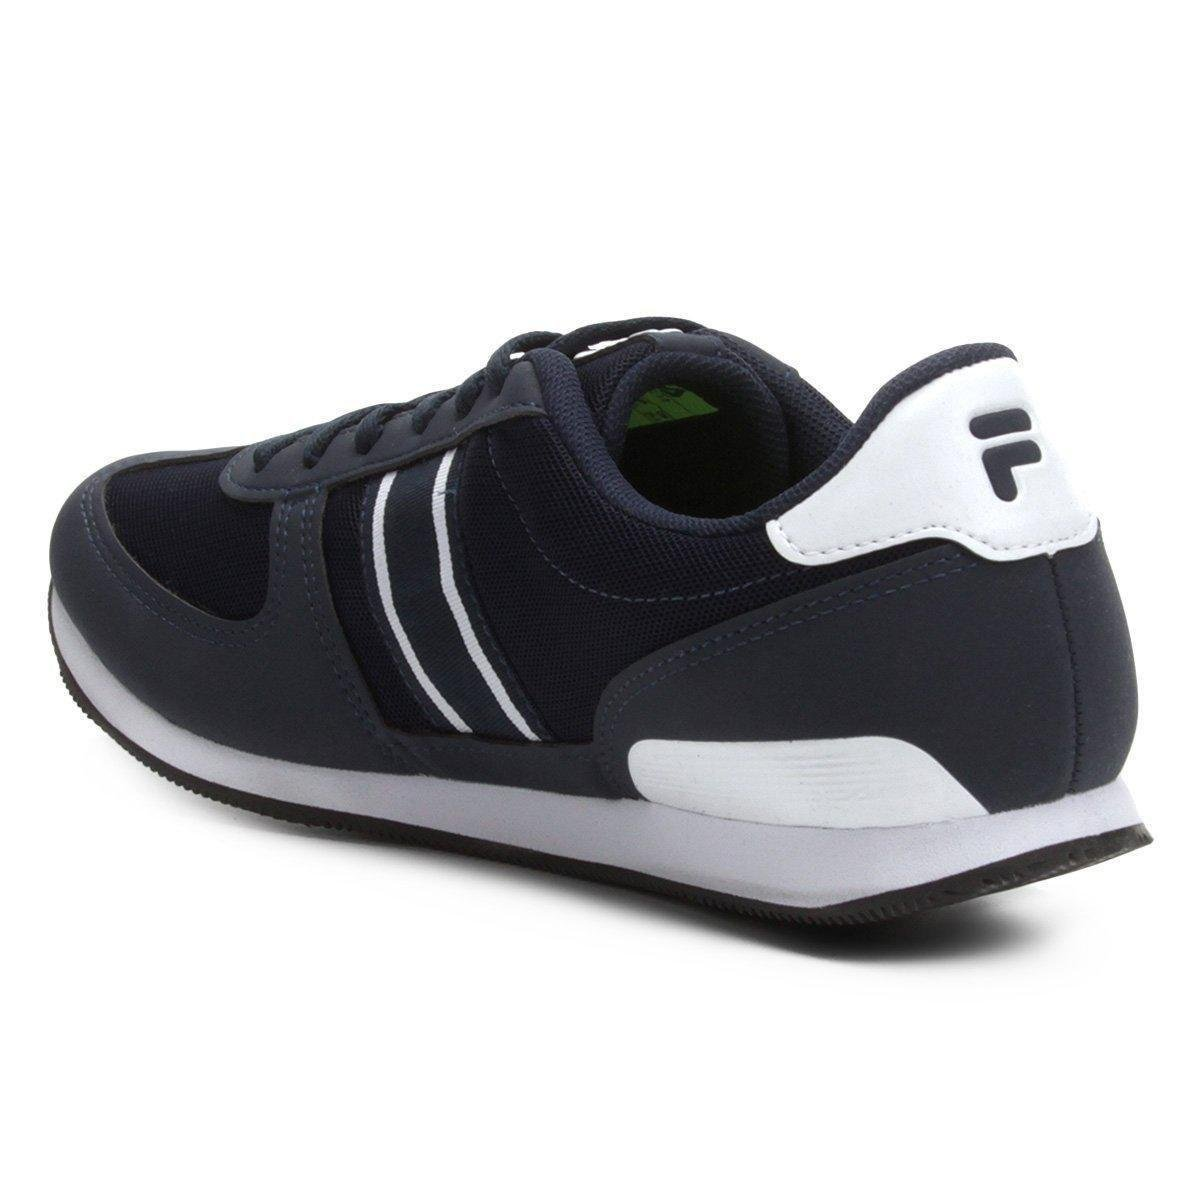 1cf205cea0 Tênis Fila F-Retro Sport 2.0 Masculino - Tam: 40 - Shopping TudoAzul